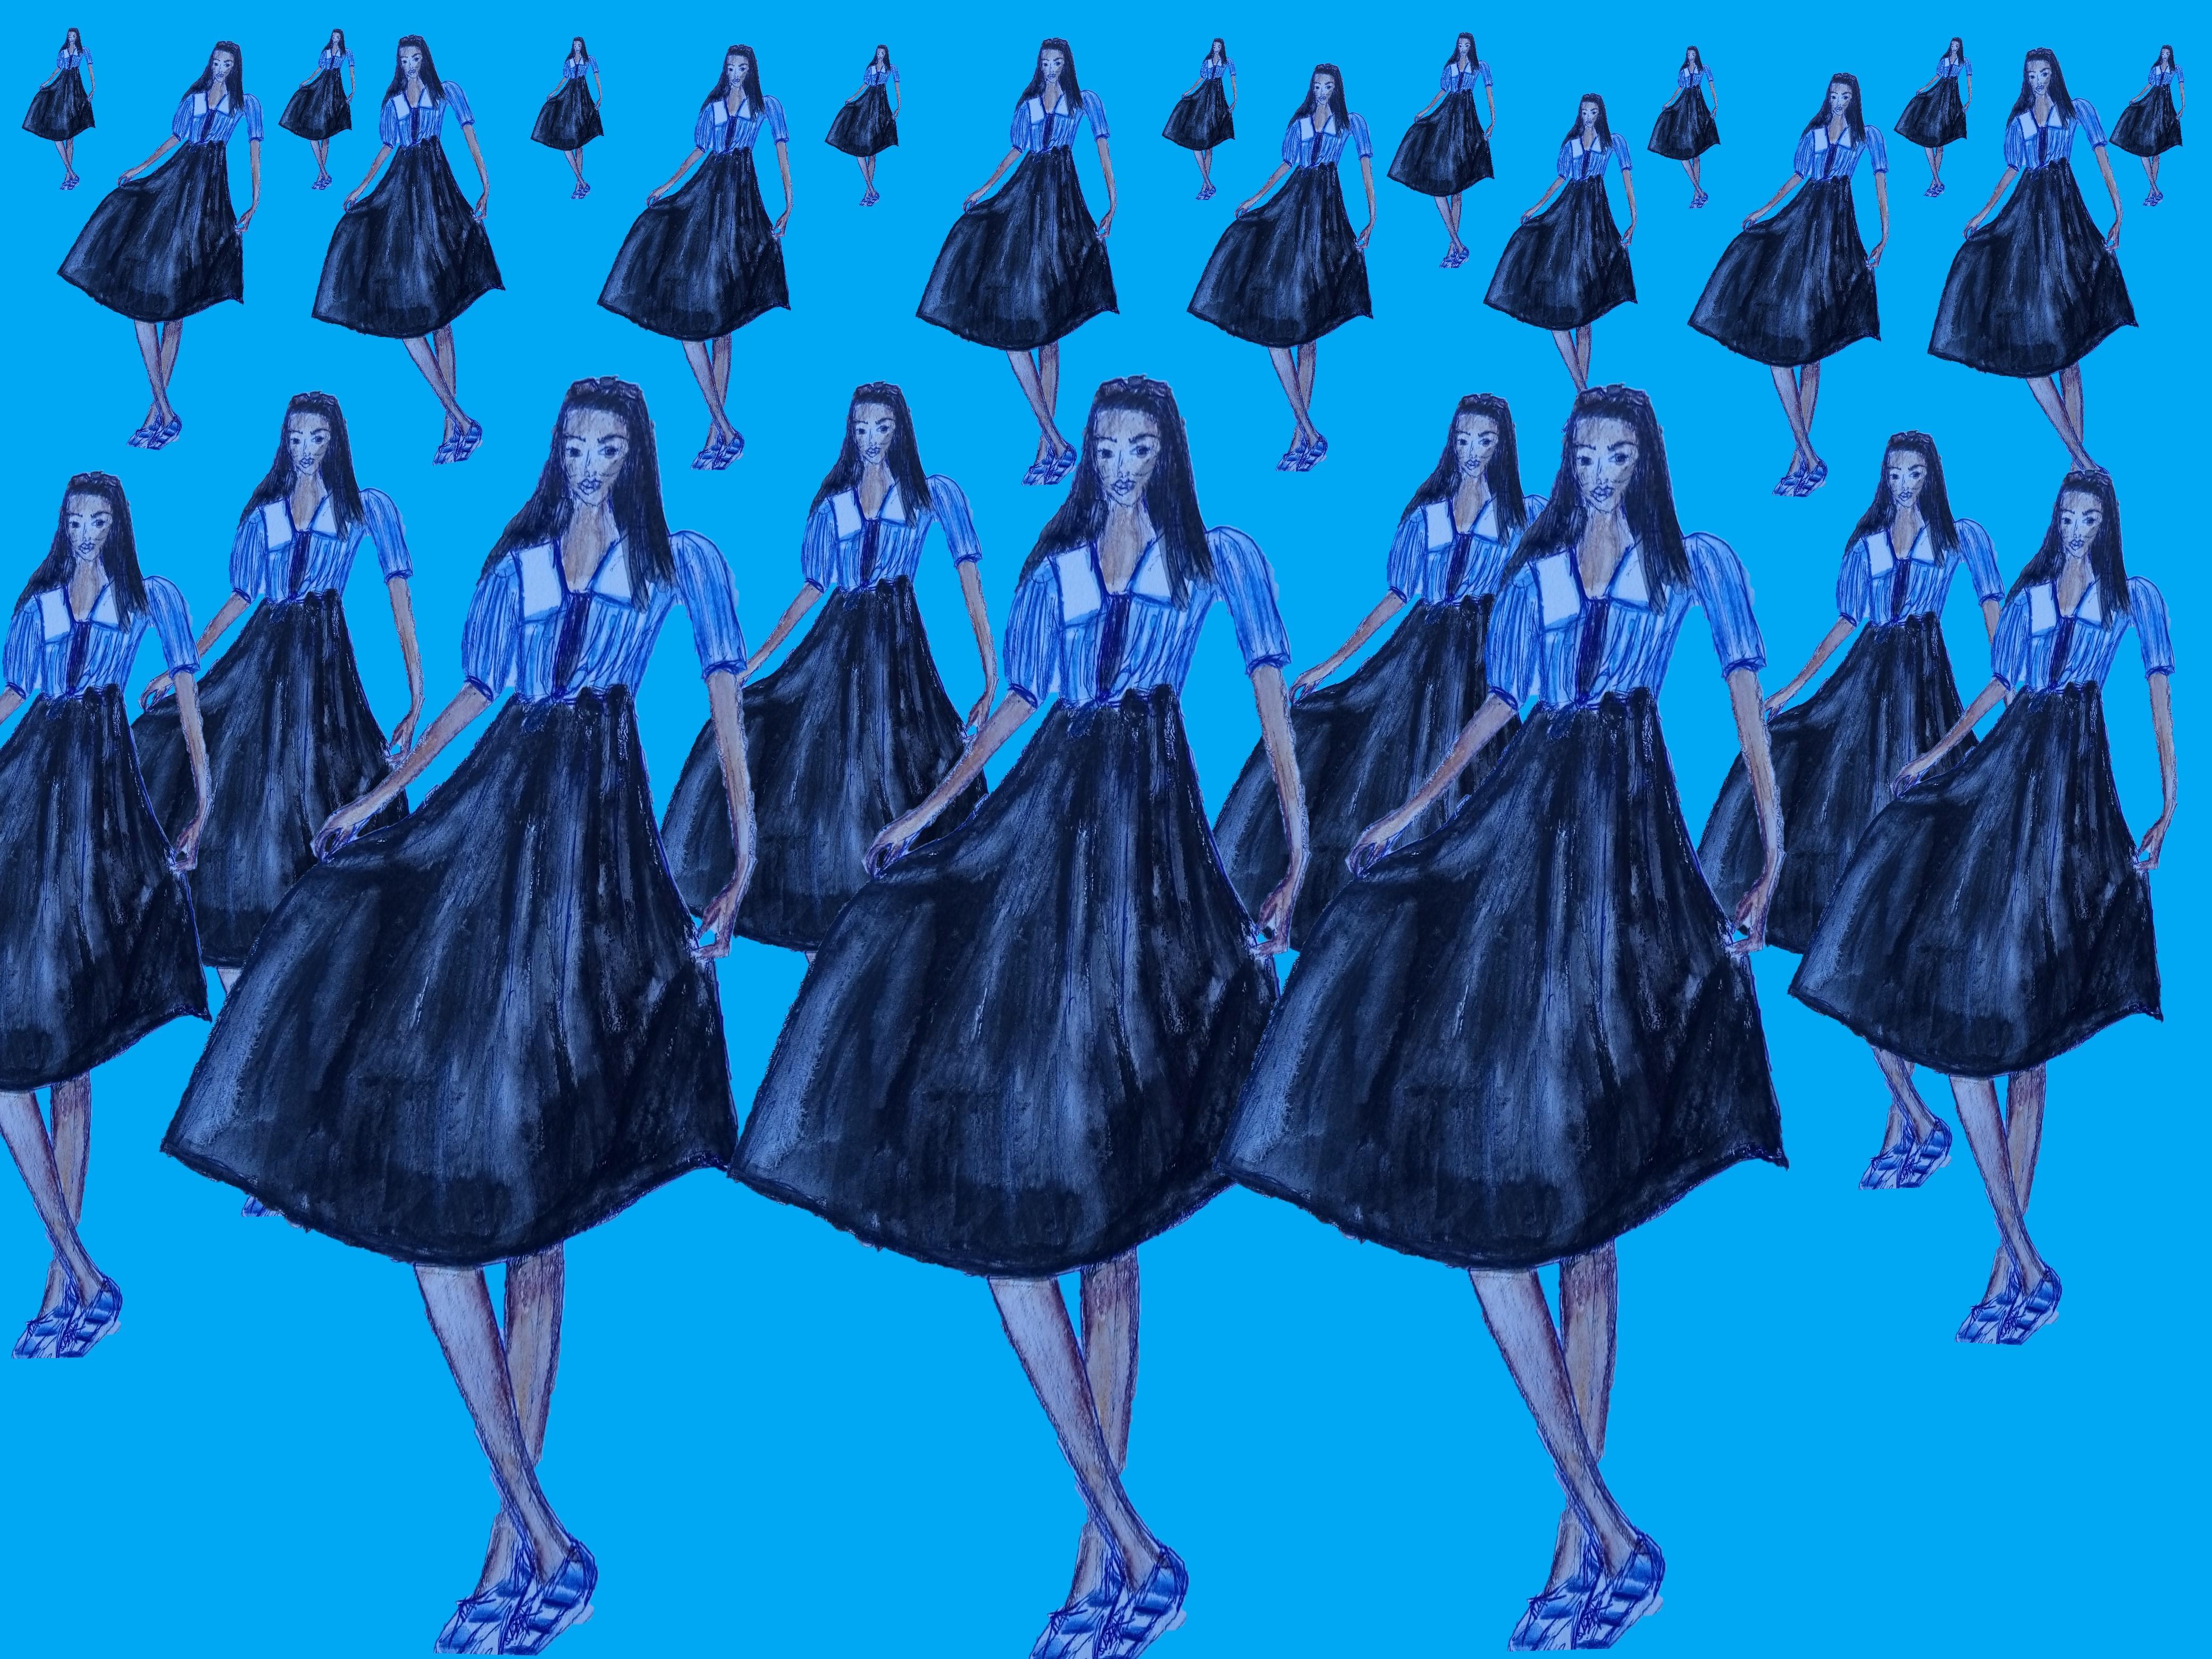 #moda #fashionillustration #modaradosti